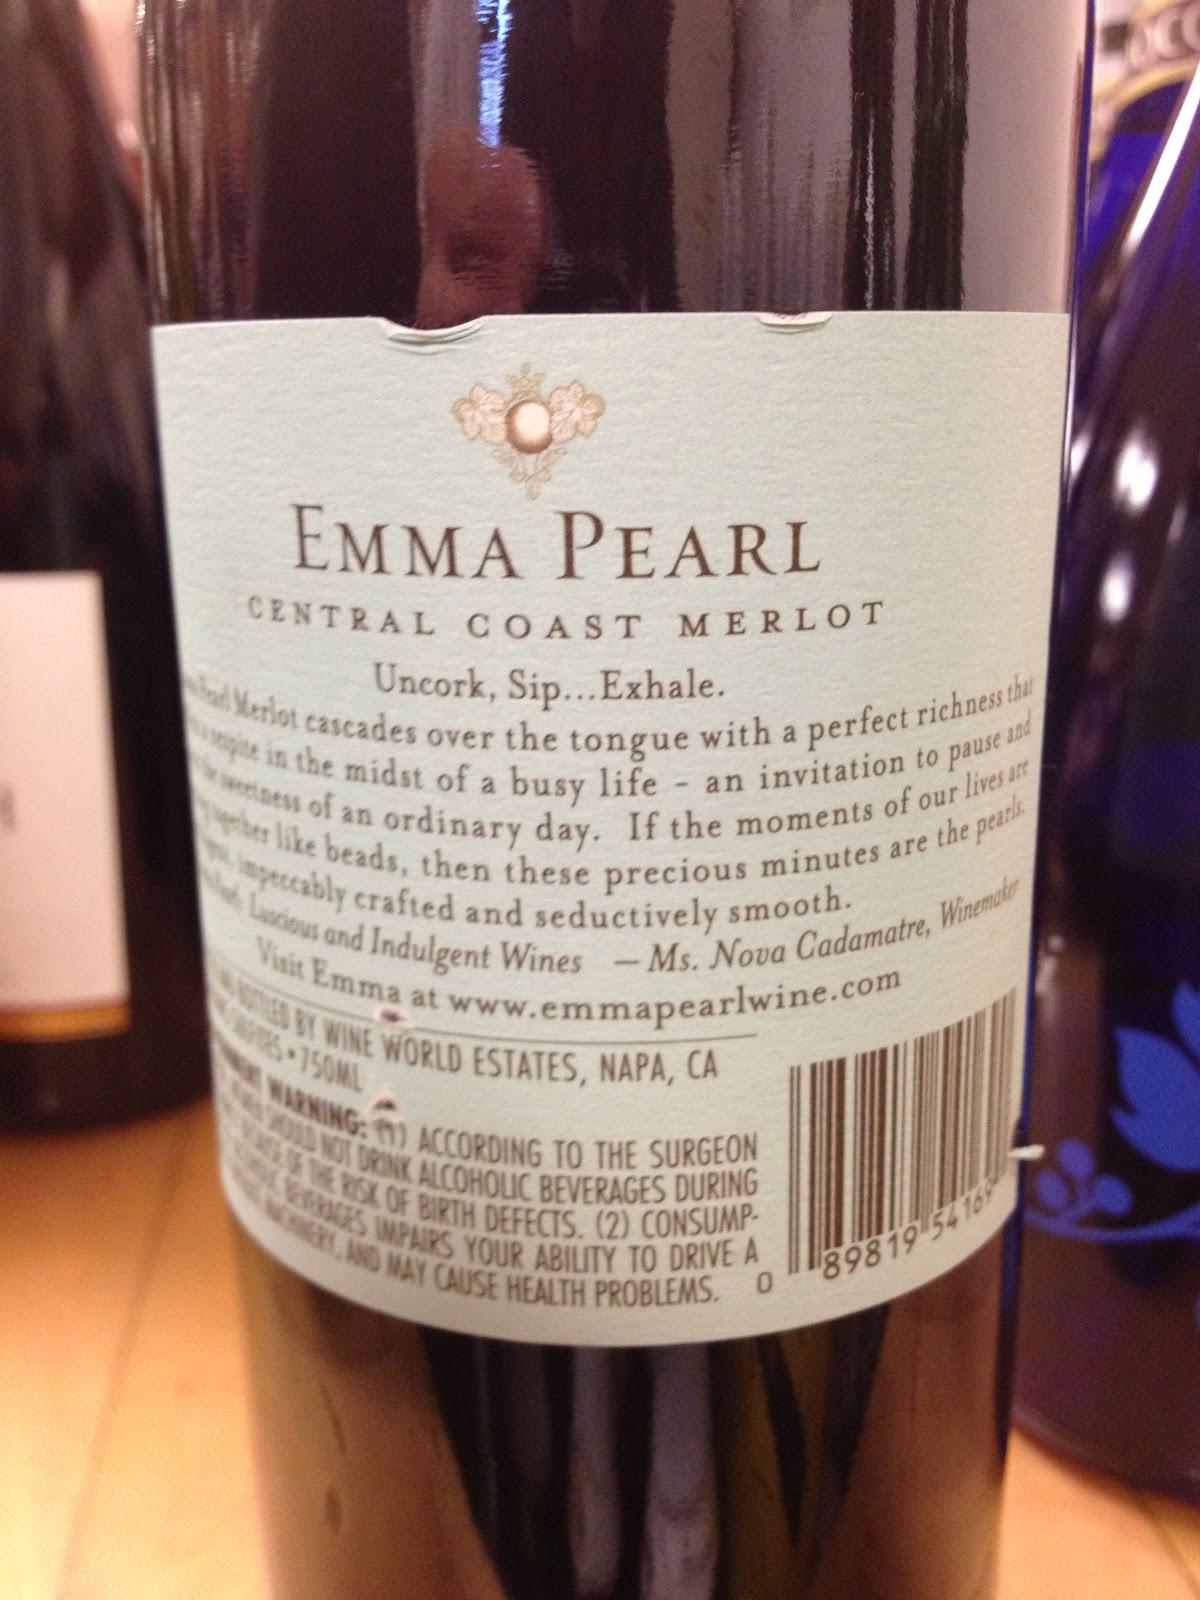 Emma Pearl